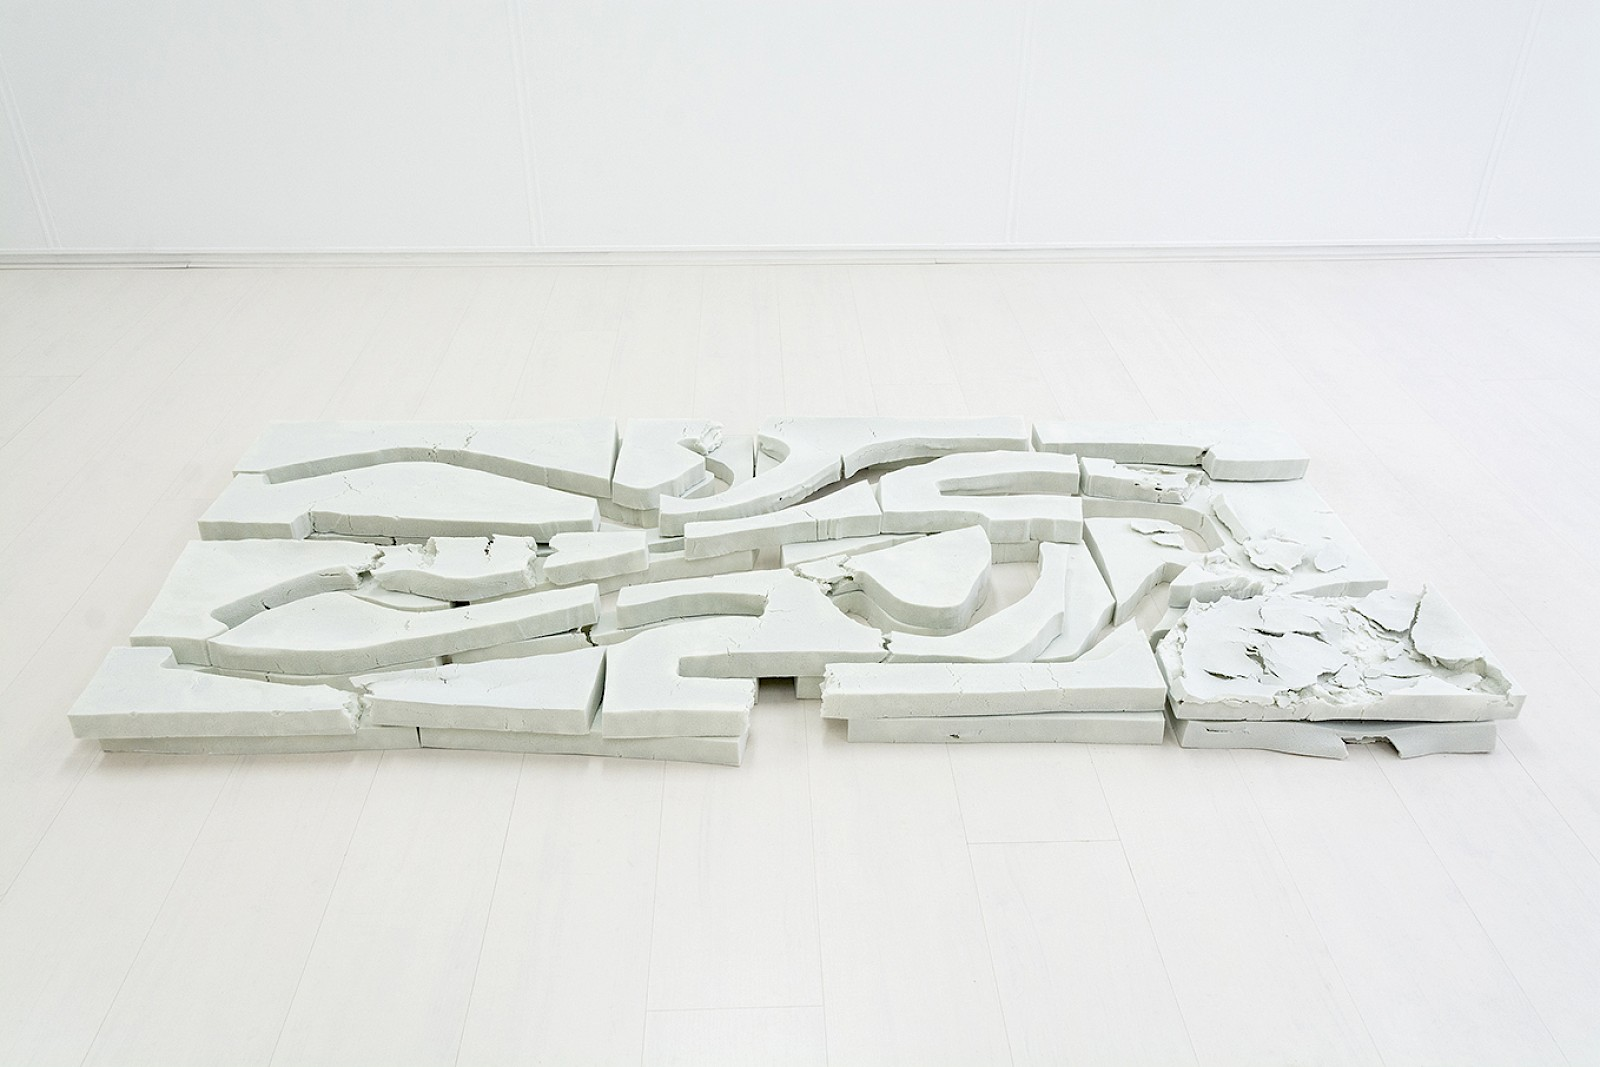 Image - Ma Packing, Porcelain, Size: 90 x 180cm